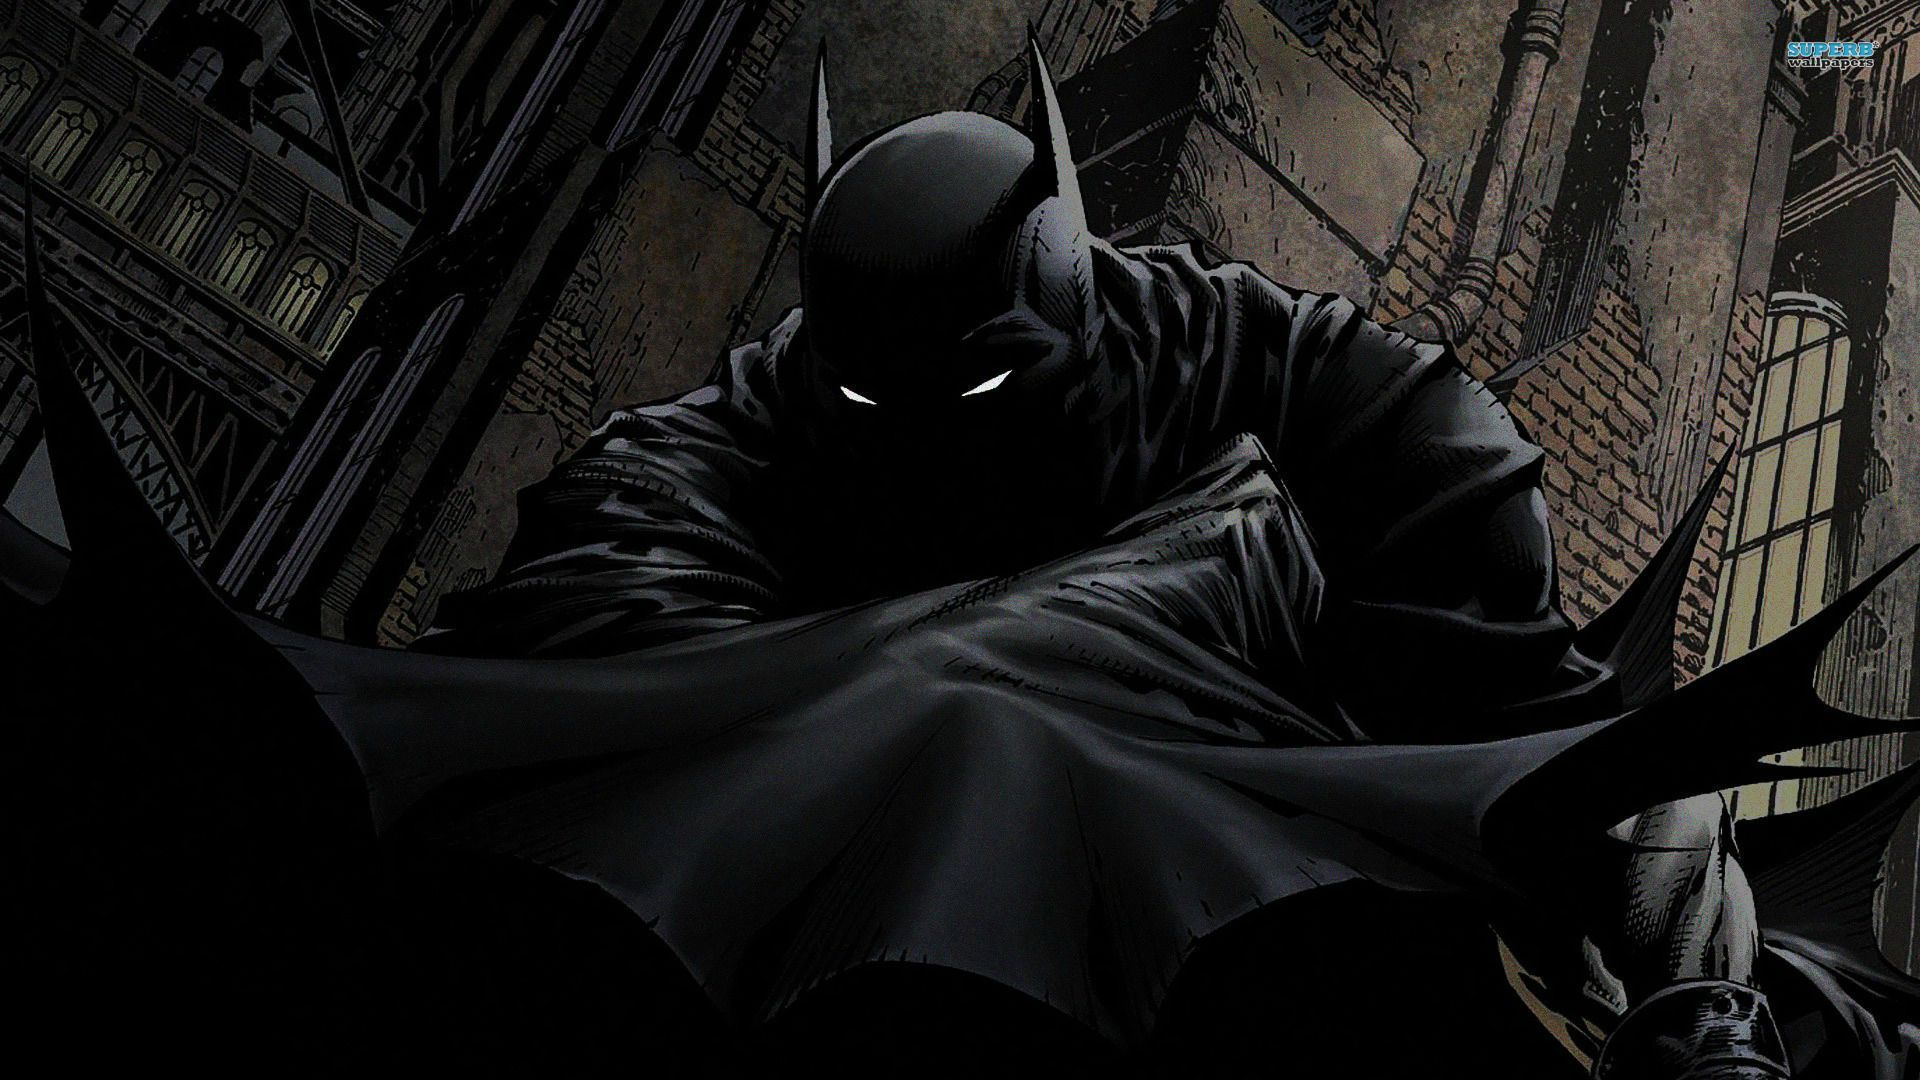 Batman Comic Wallpapers High Resolution Batman Wallpaper Batman Illustration Batman Cartoon